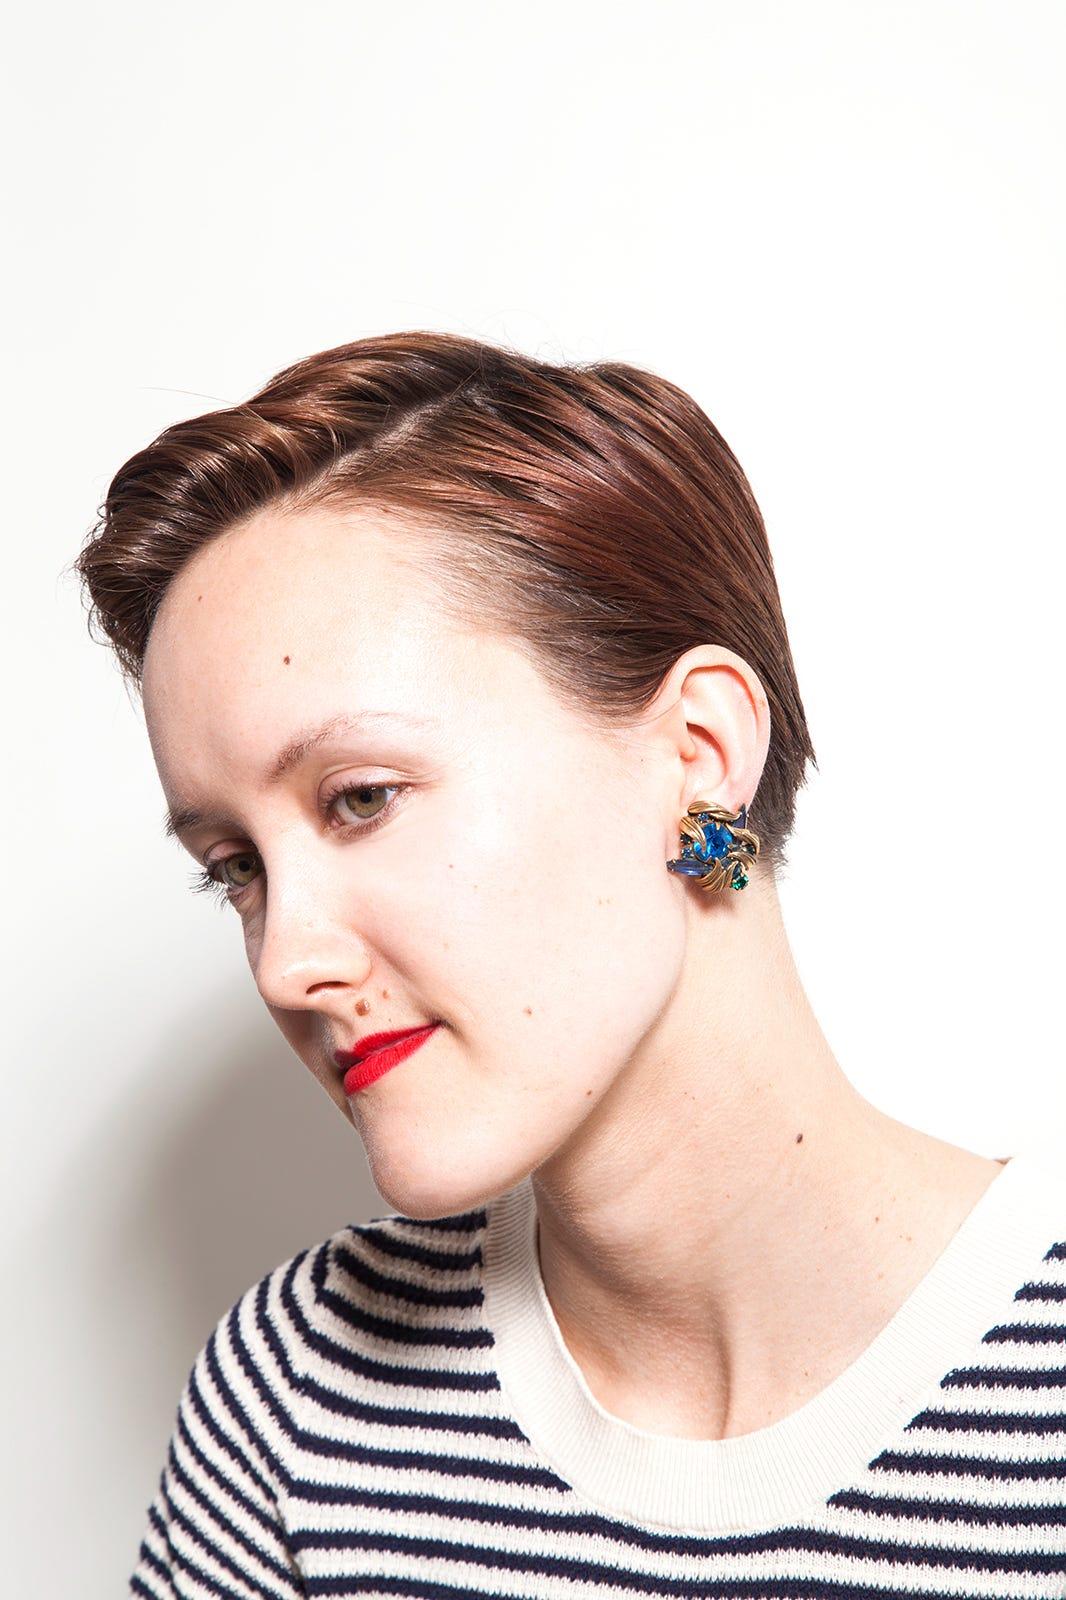 Outstanding Overnight Hair Tips Style Tricks Advice Short Hairstyles Gunalazisus